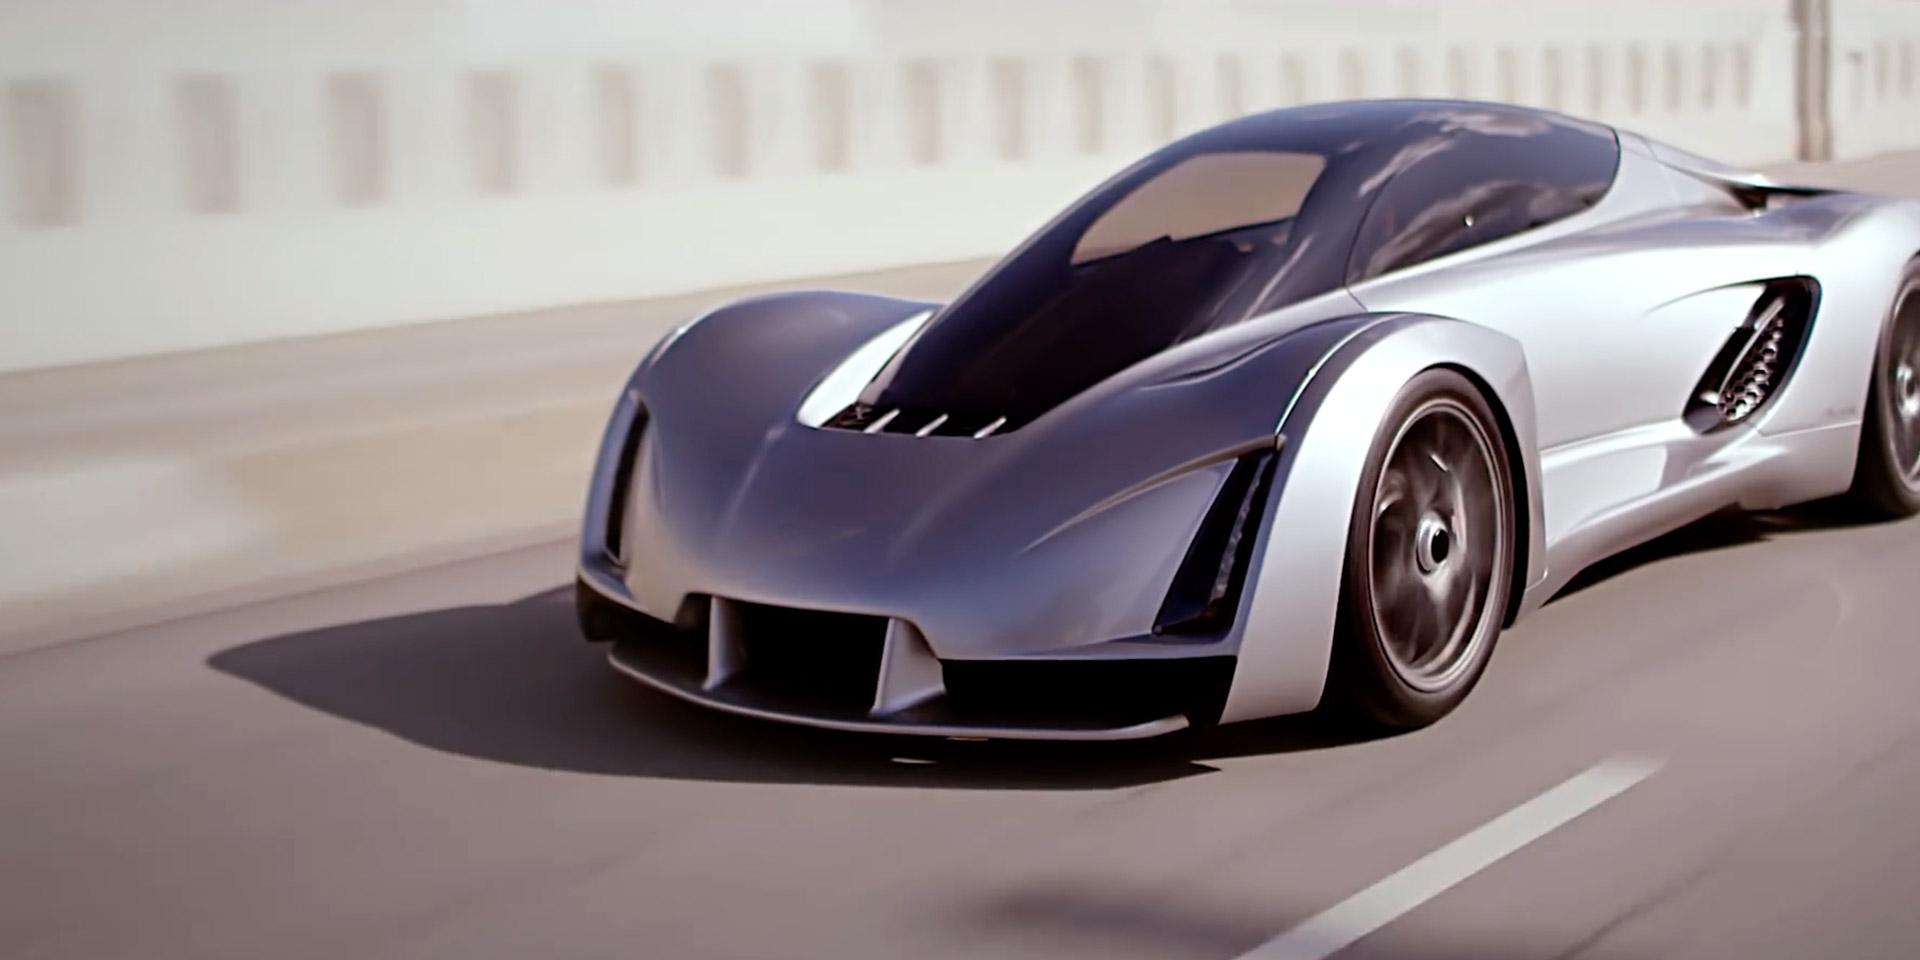 quoi ressemblera la voiture de demain ignition in action. Black Bedroom Furniture Sets. Home Design Ideas